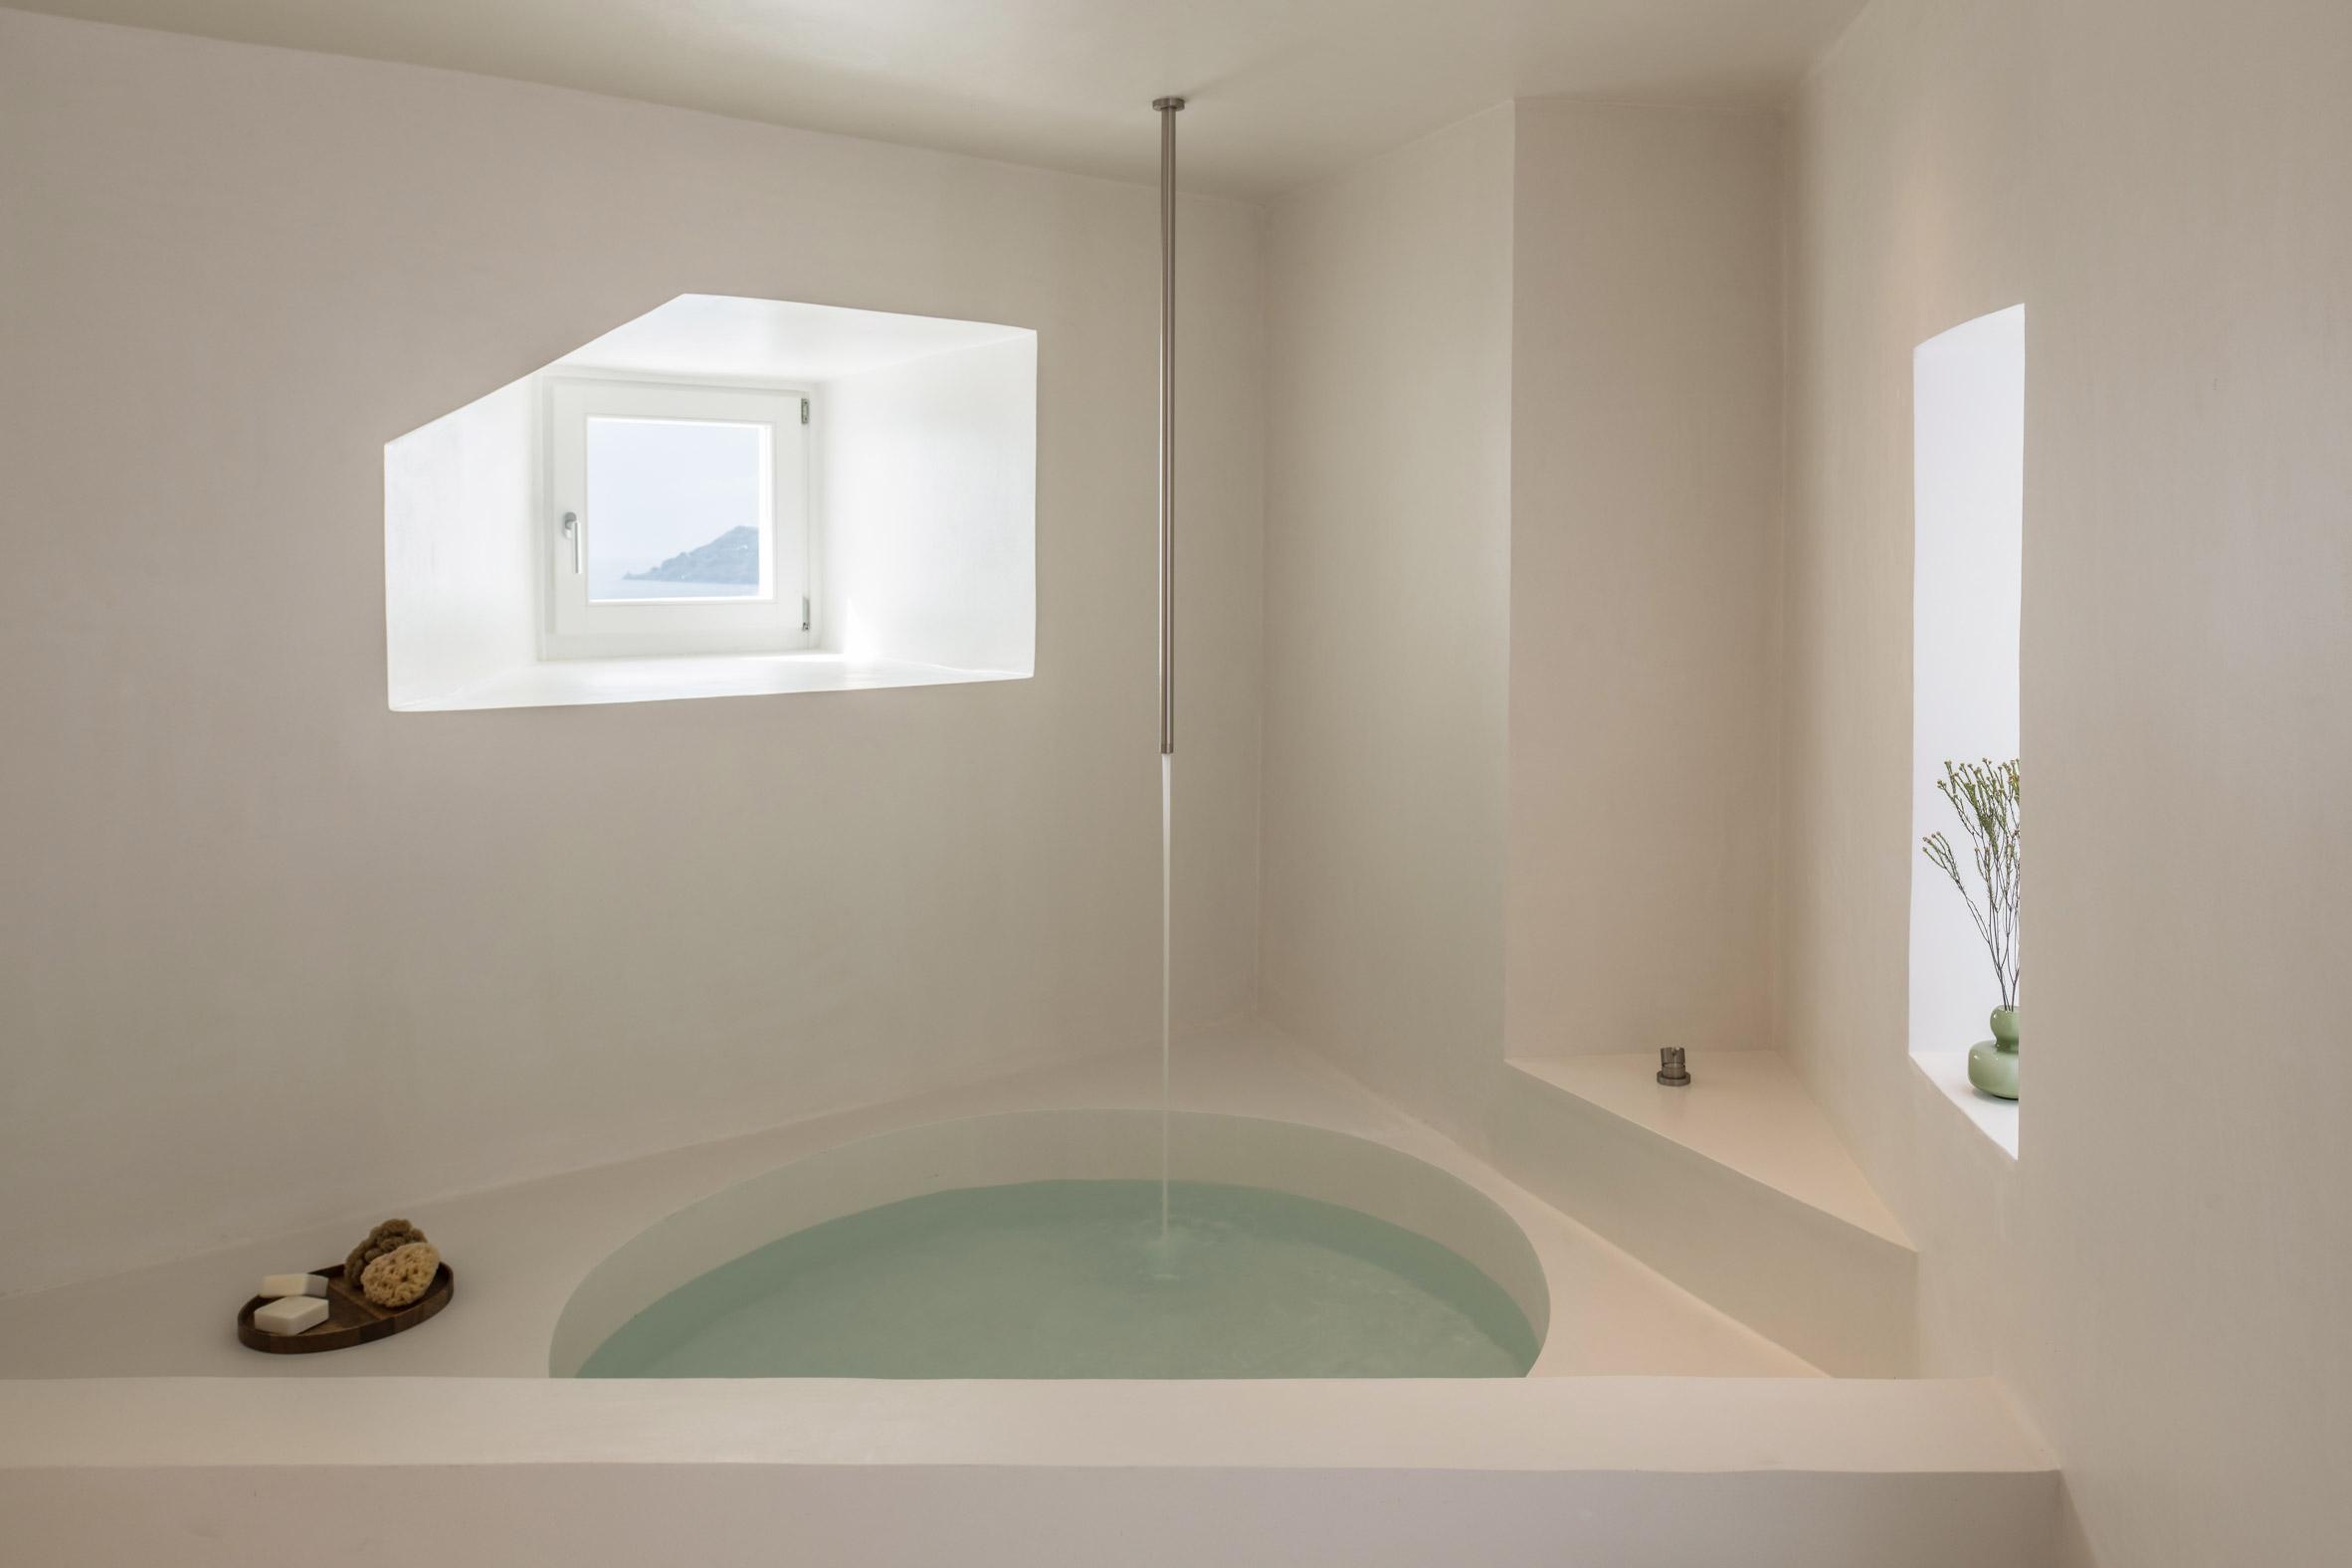 18_Saint Hotel_Kapsimalis Architects_Inspirationist